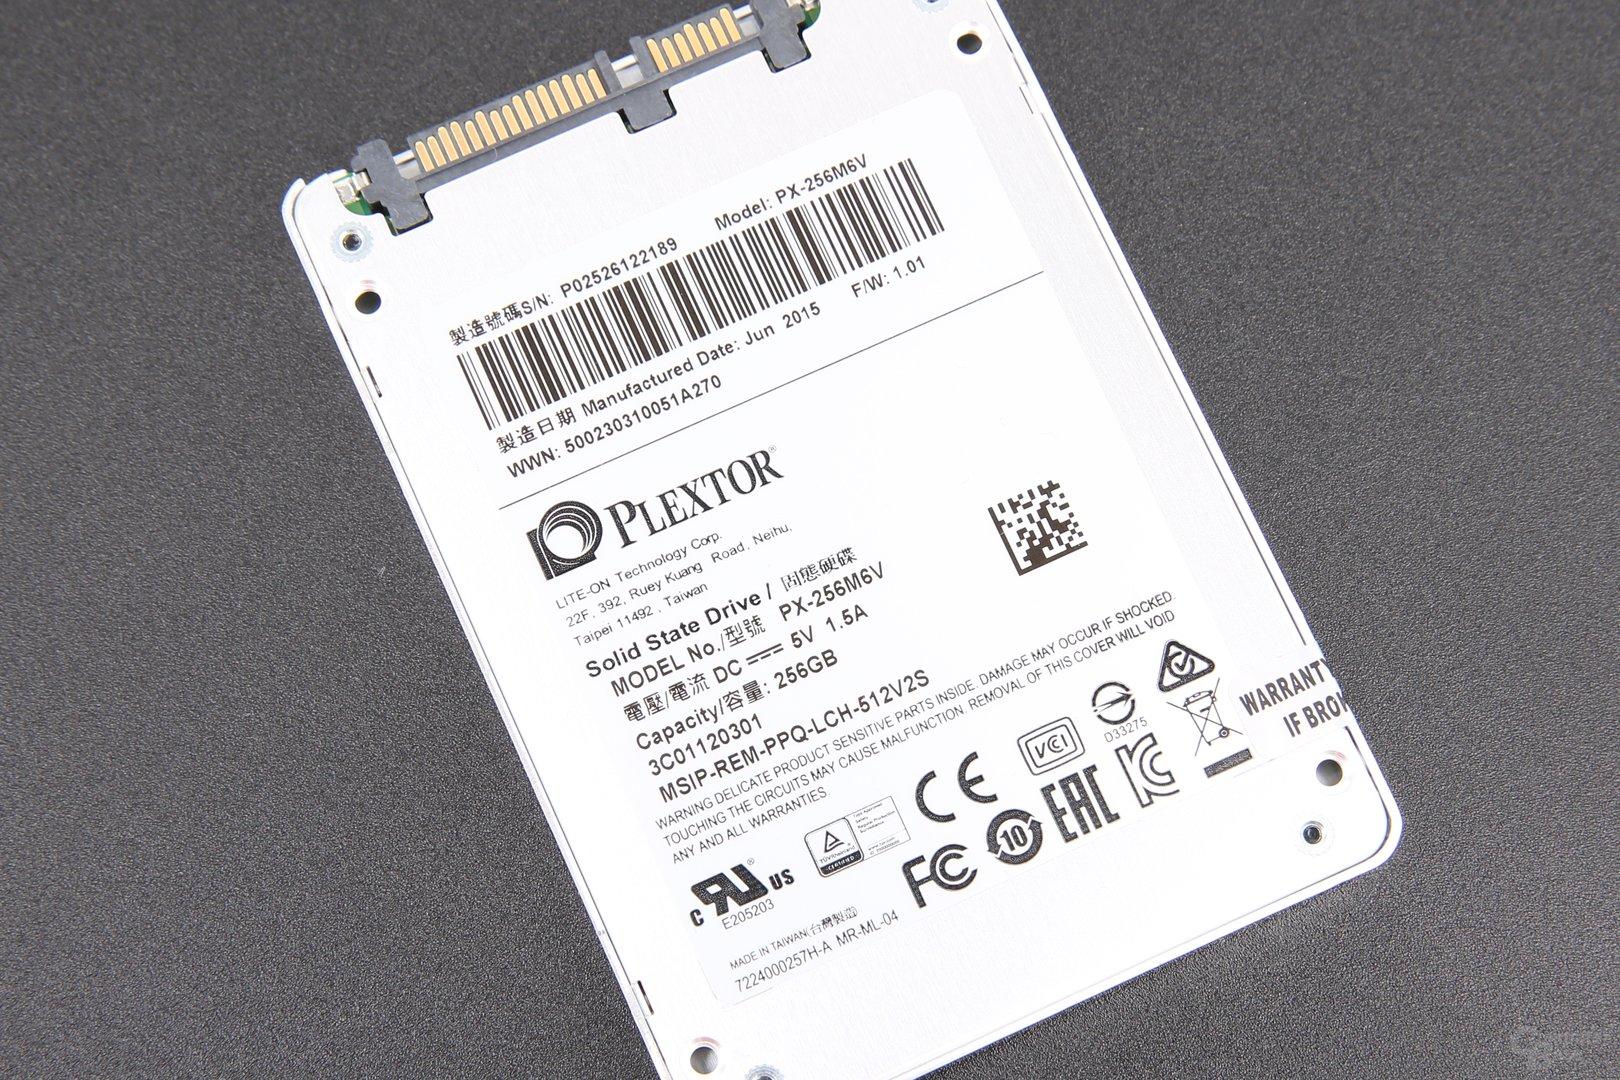 Plextor M6V 256 GB